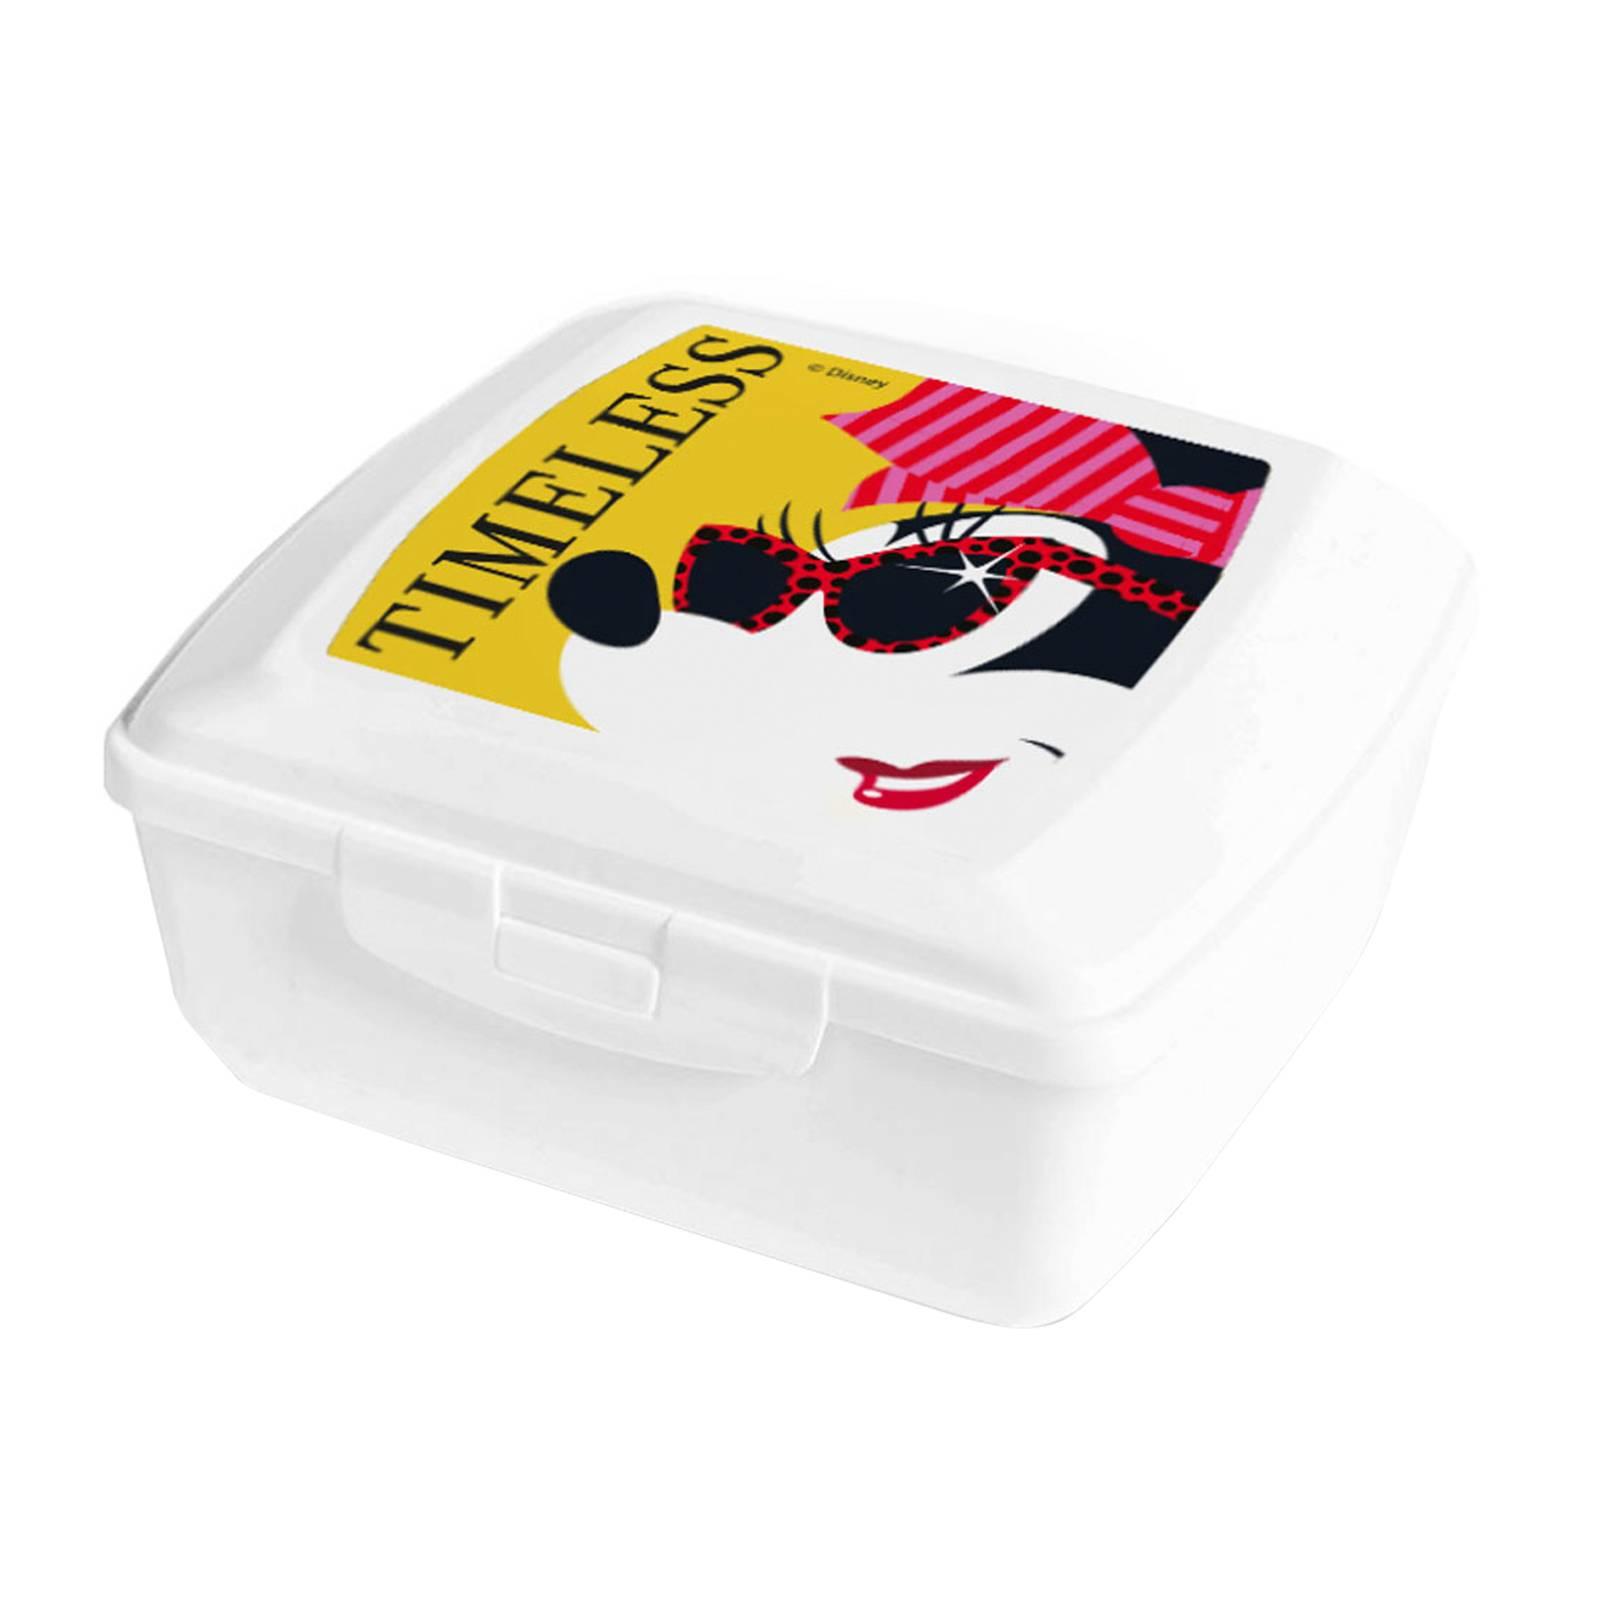 Boîte à goûter Minnie Hollywood 14,5 x 13 cm DISNEY / AMBITION